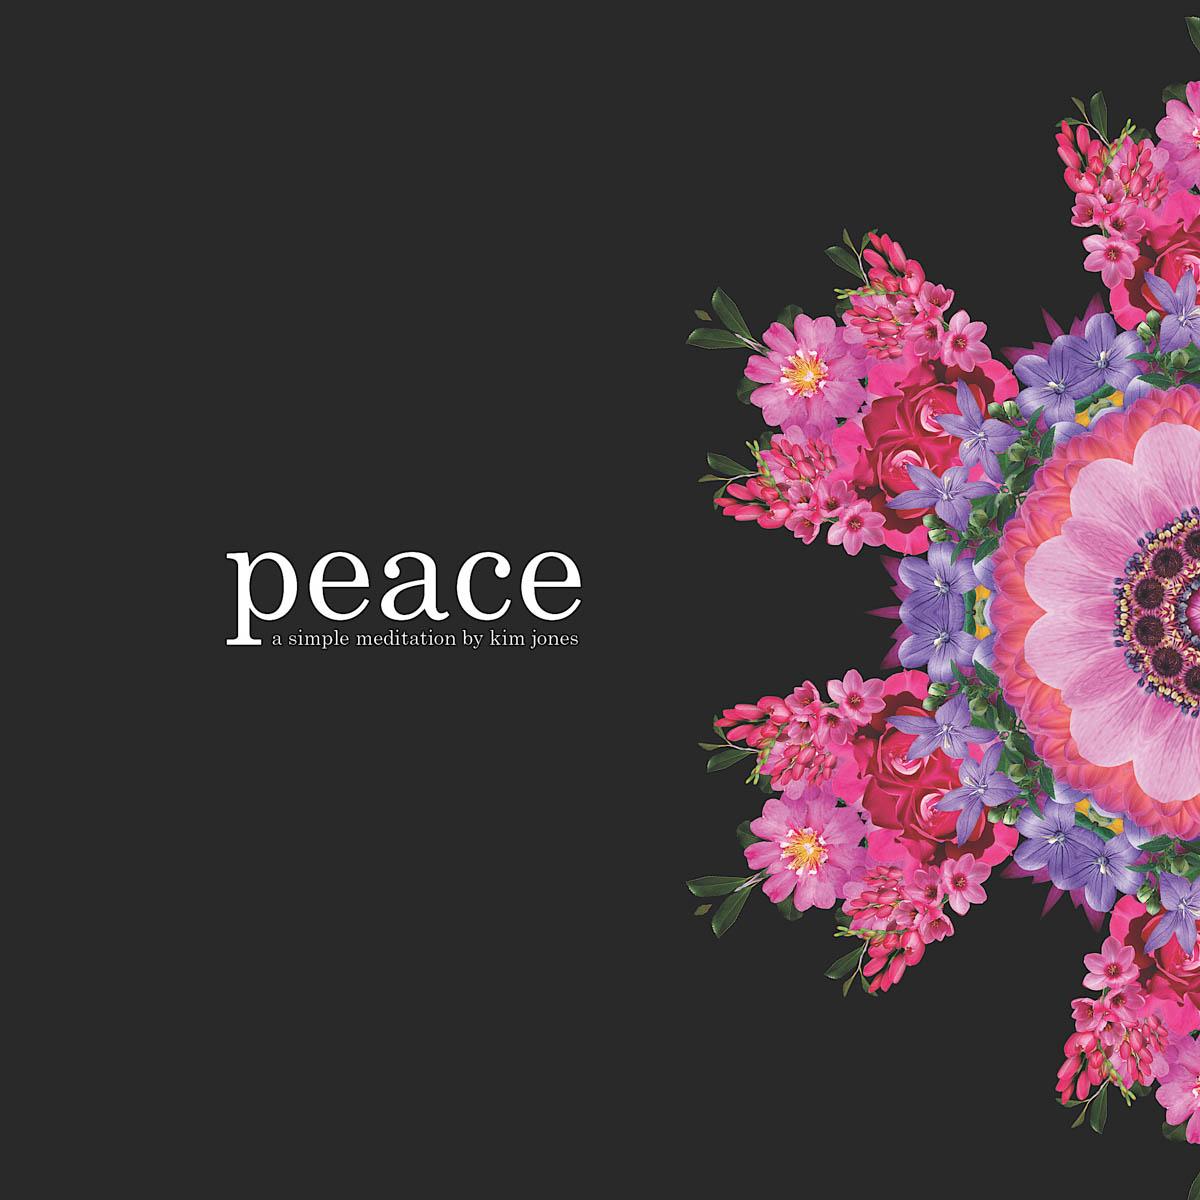 peace: a simpl meditation